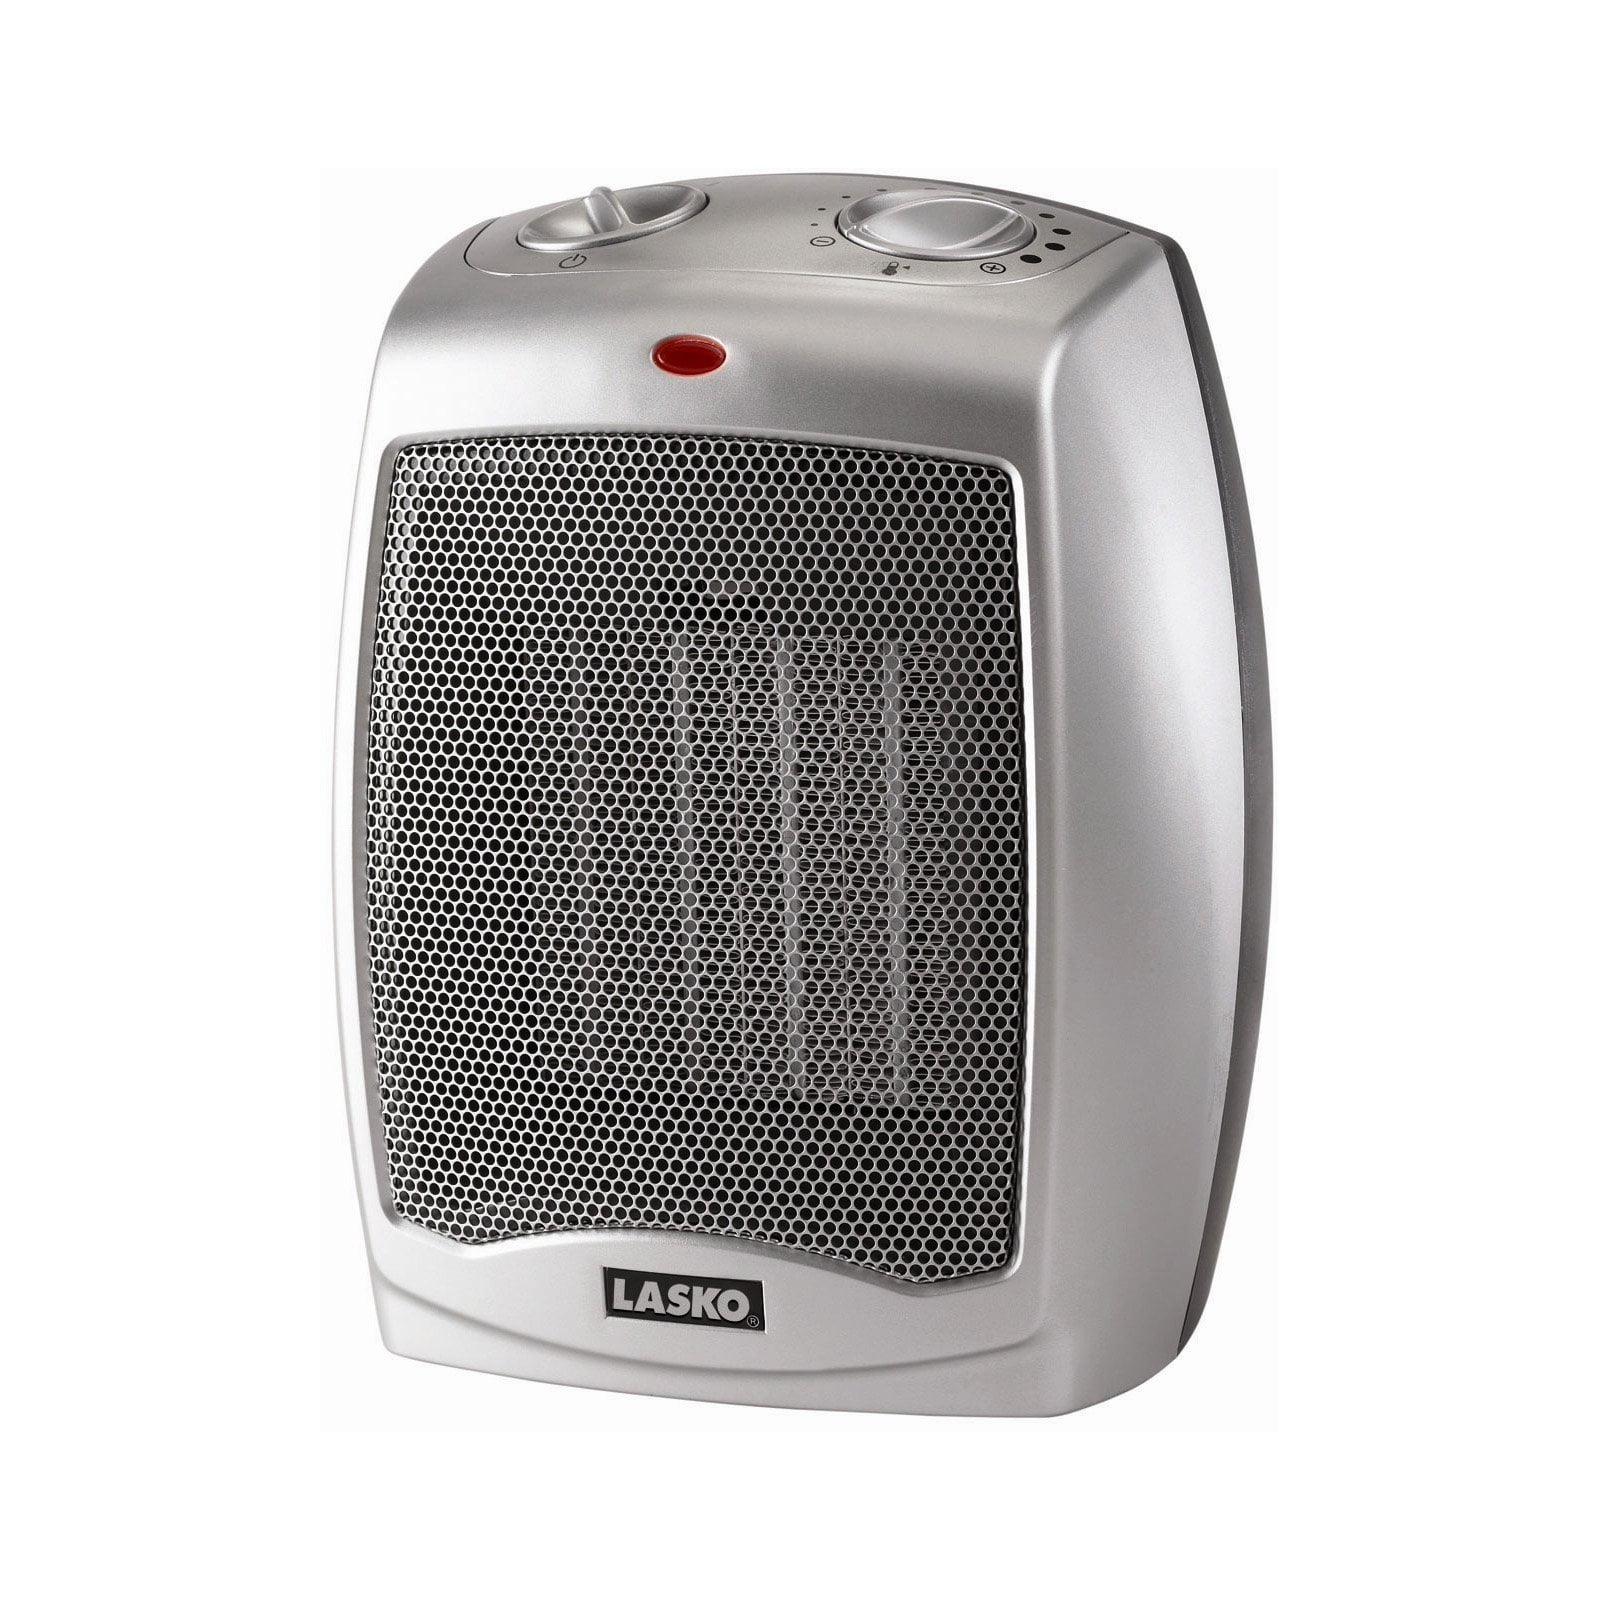 Lasko Electric Ceramic 1500W Heater, Silver Black, 754200 by Lasko Products